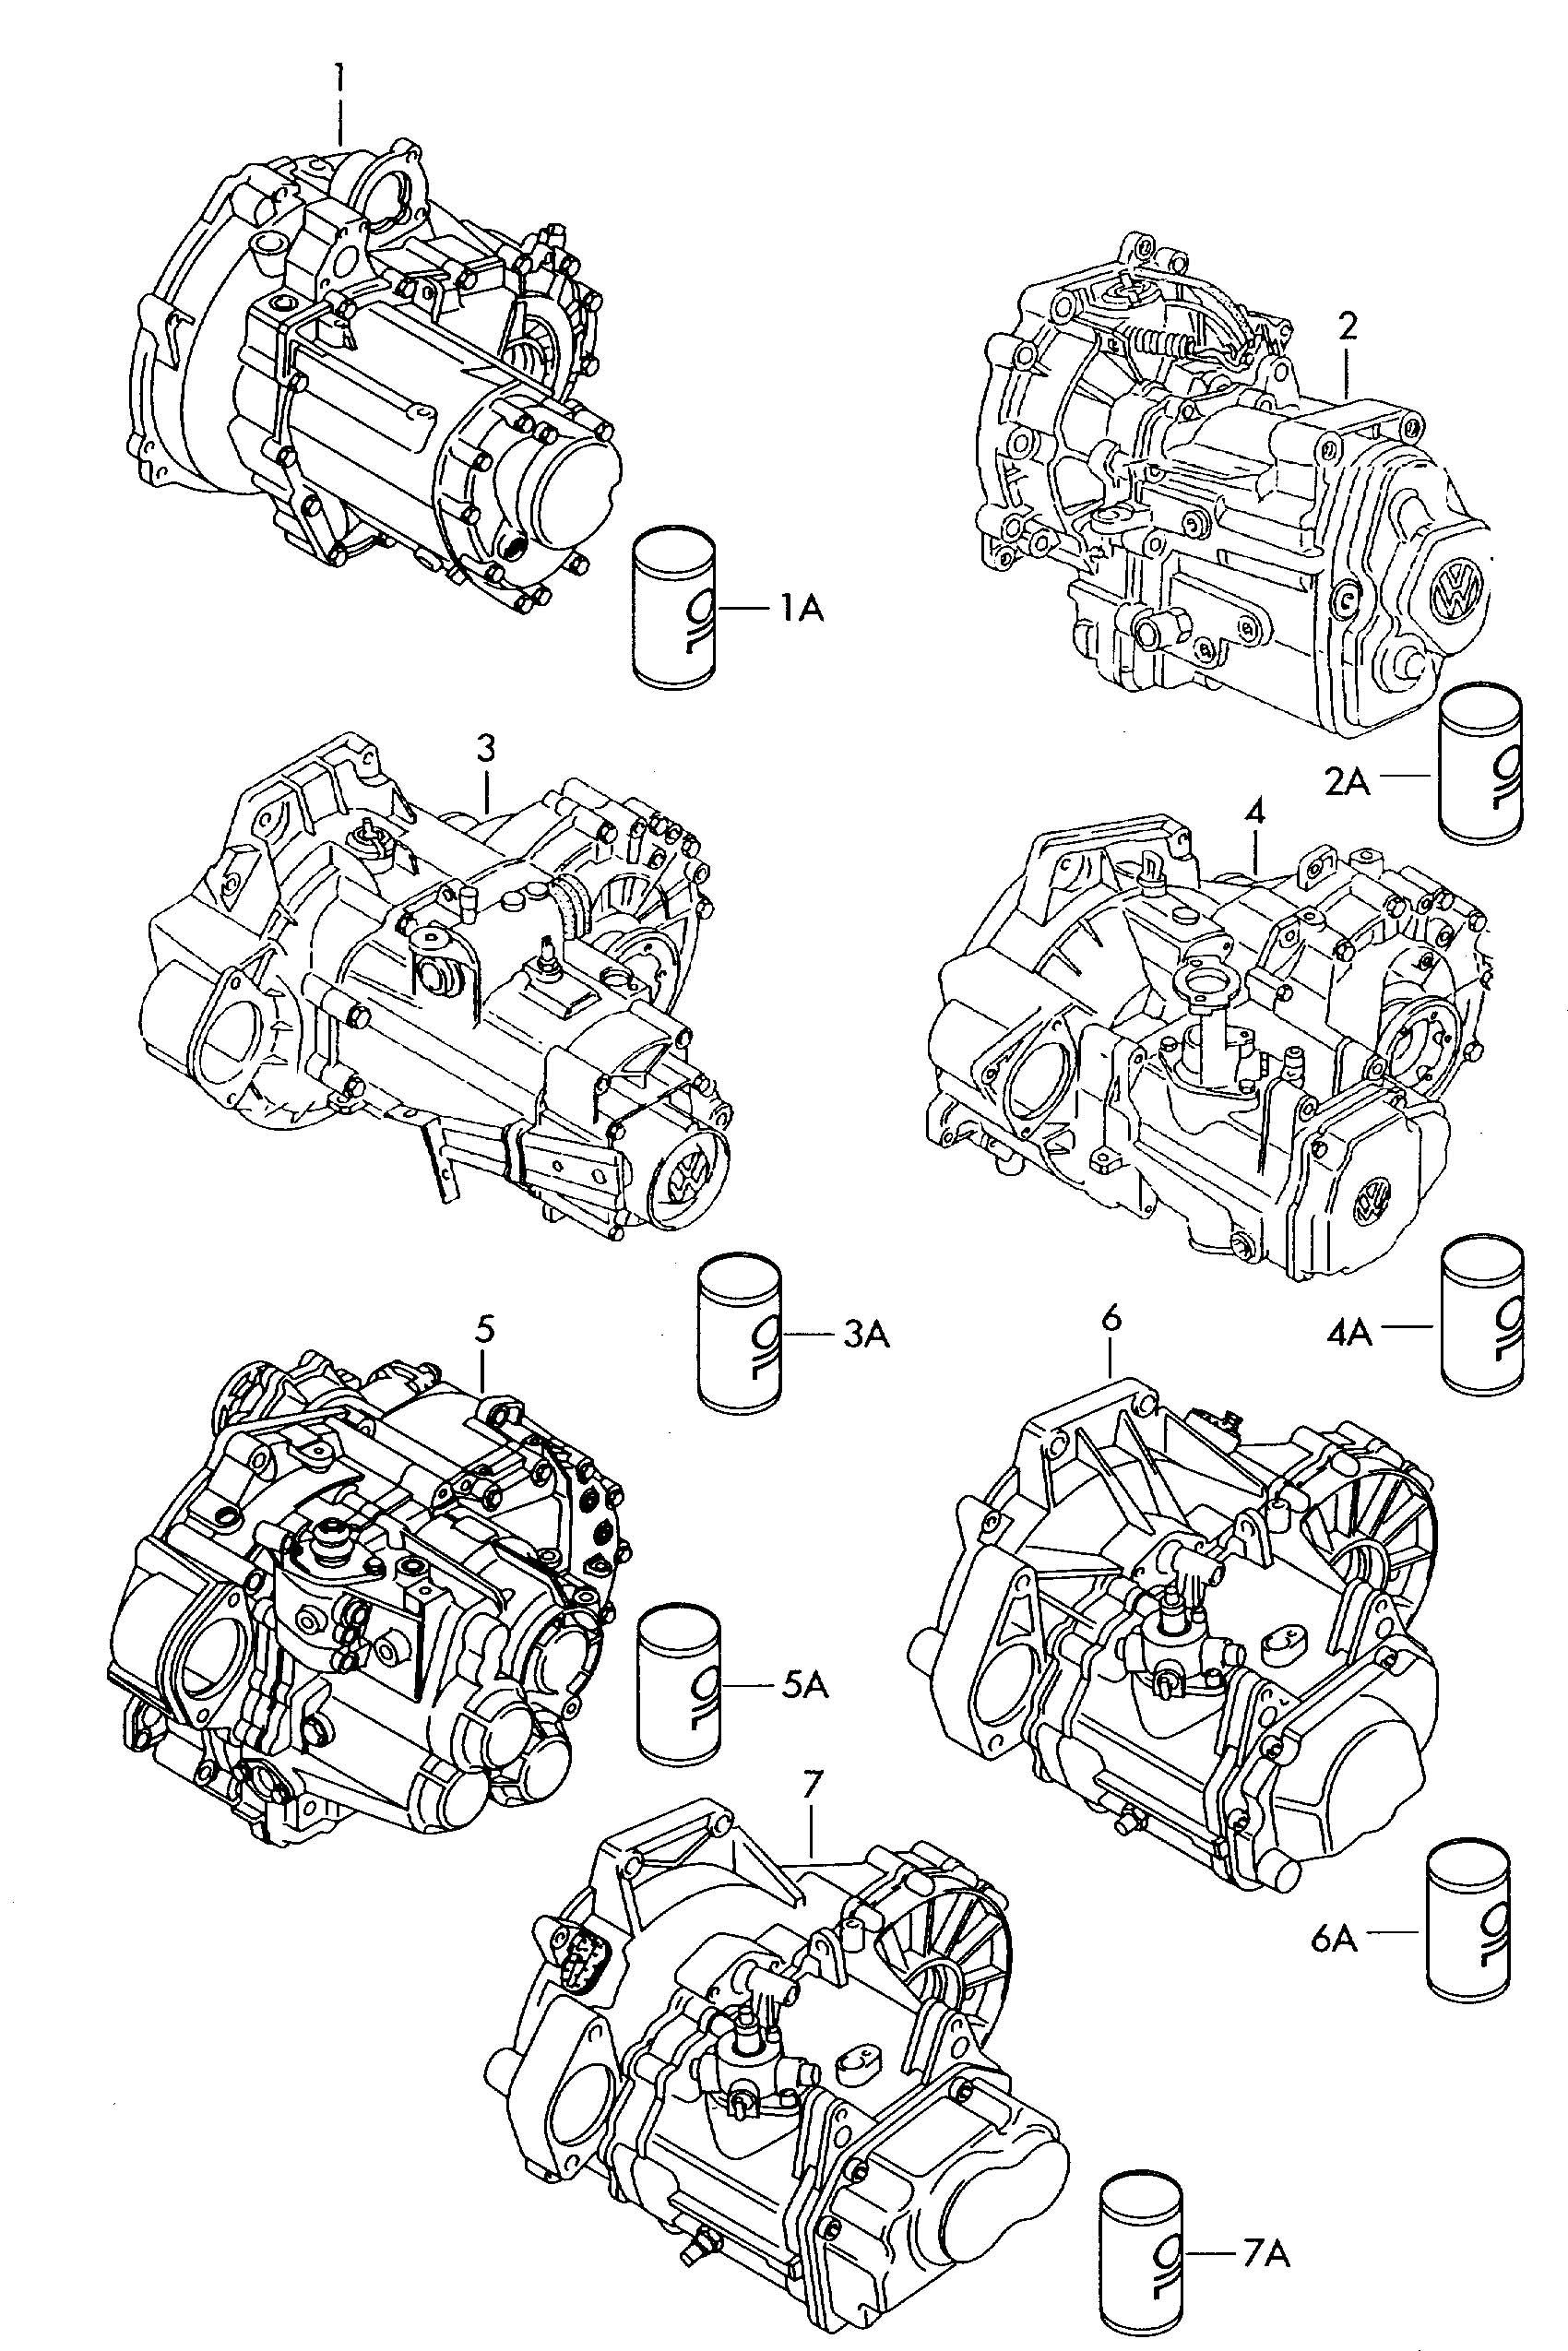 Volkswagen Jetta Transmission oil servicing materials for